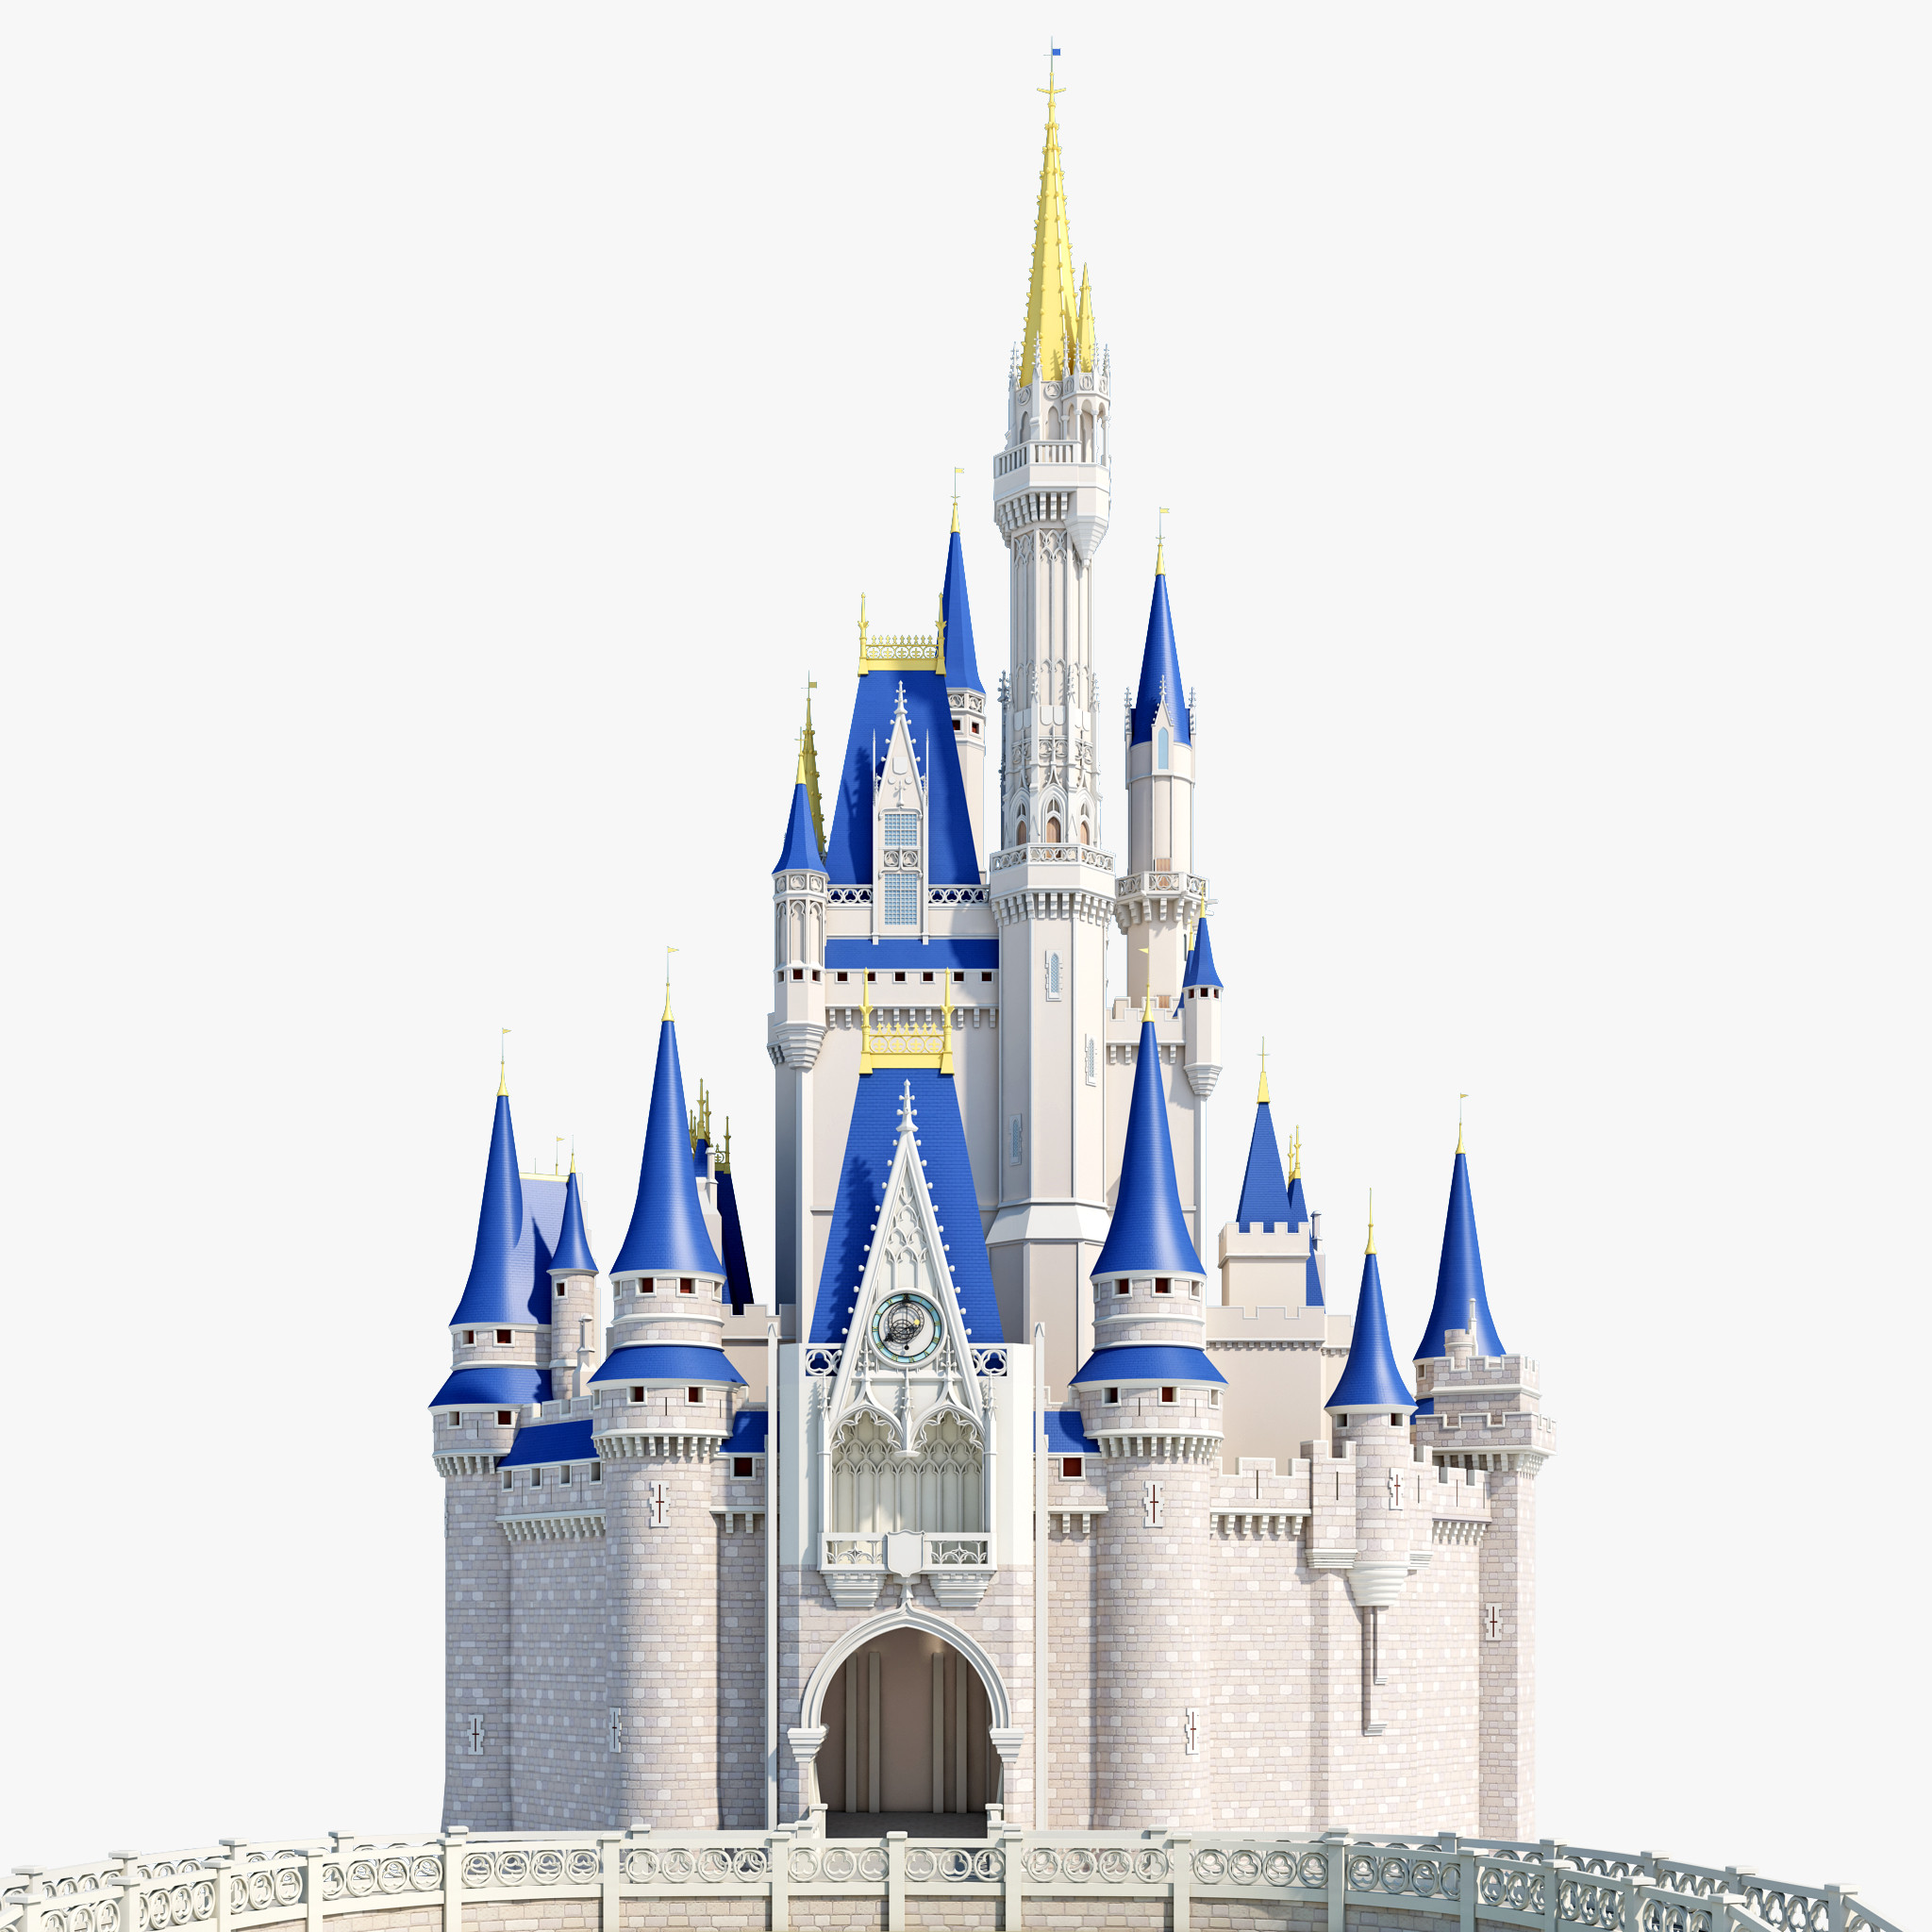 Castle clipart cinderella castle #7